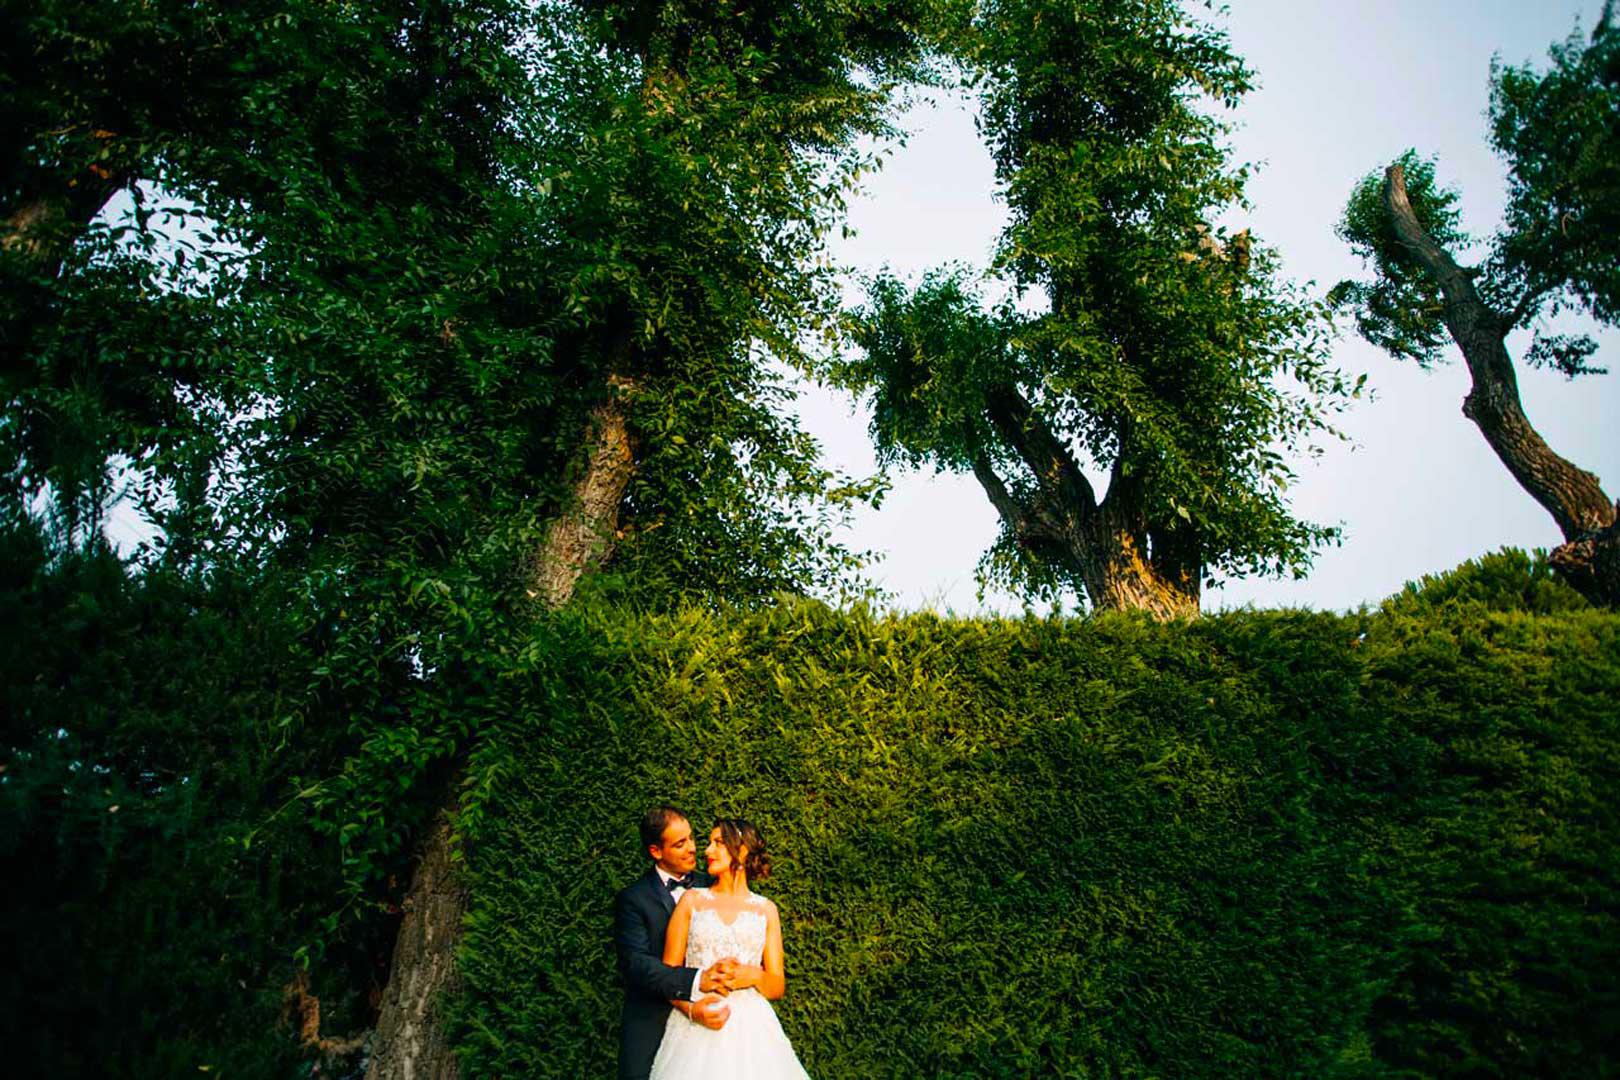 000-matrimonio-puglia-gianni-lepore-fotografo-lucera